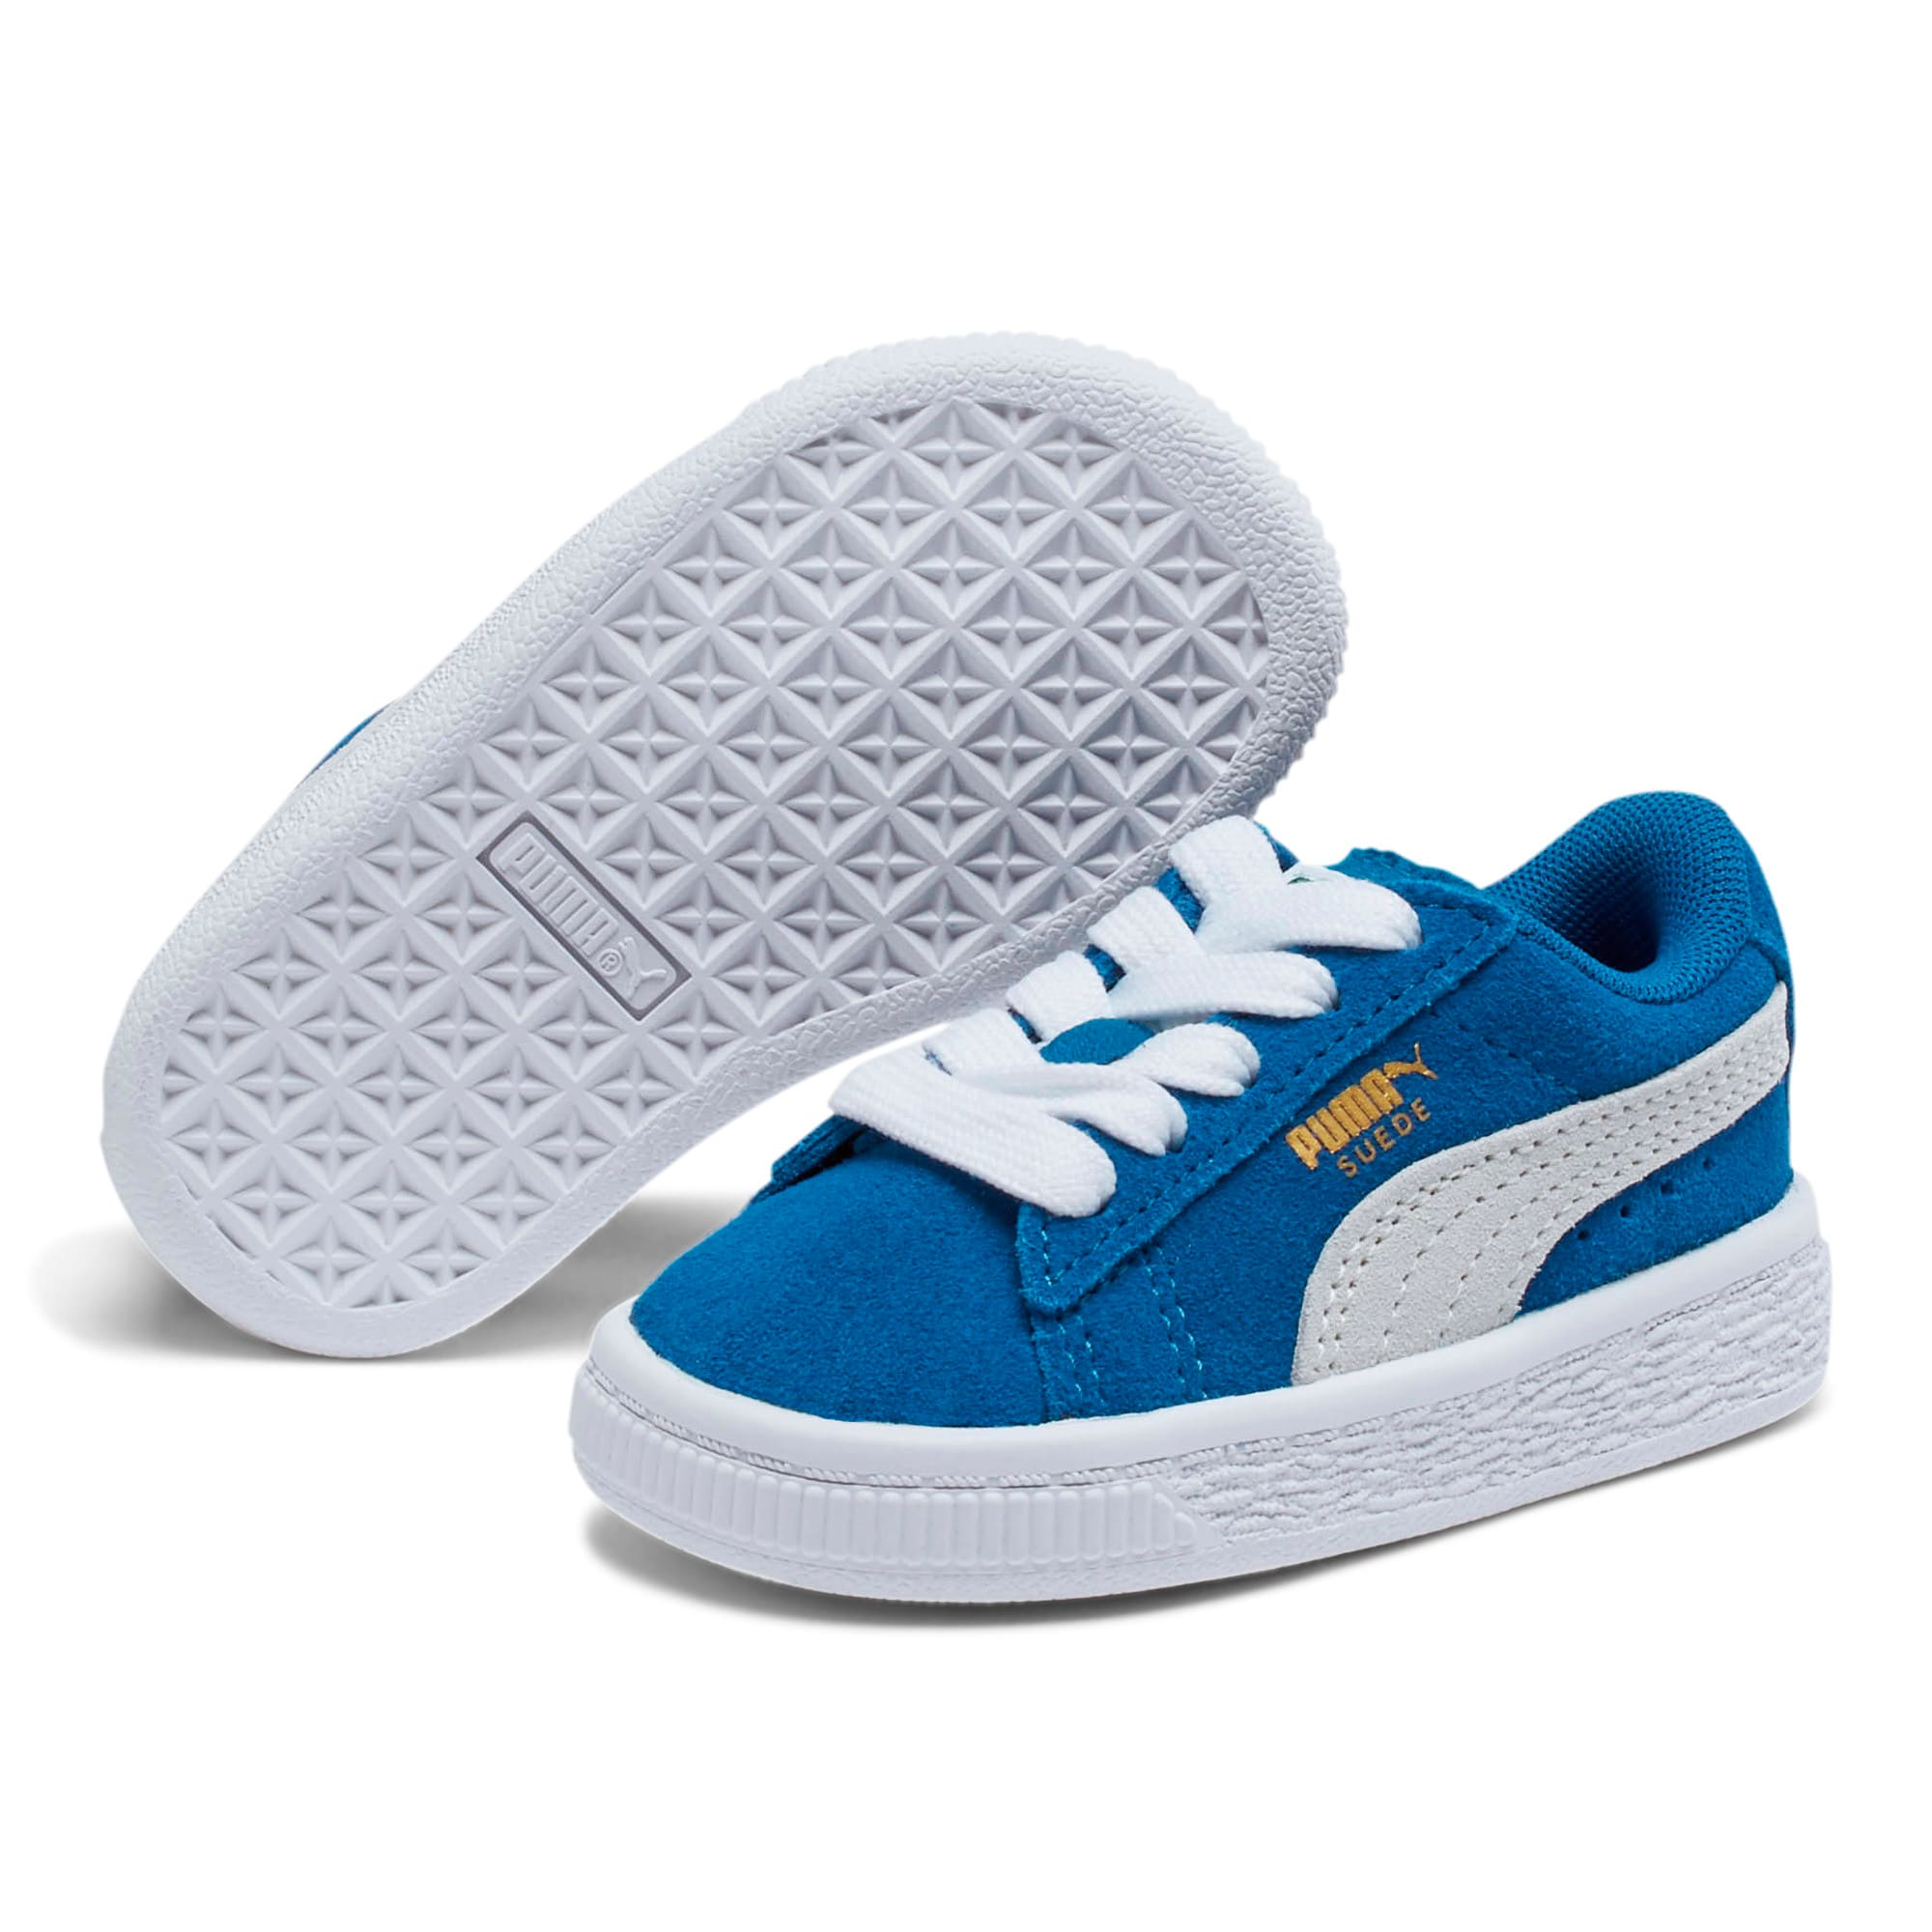 Thumbnail 2 of Puma Suede Toddler Shoes, Snorkel Blue-Puma White, medium